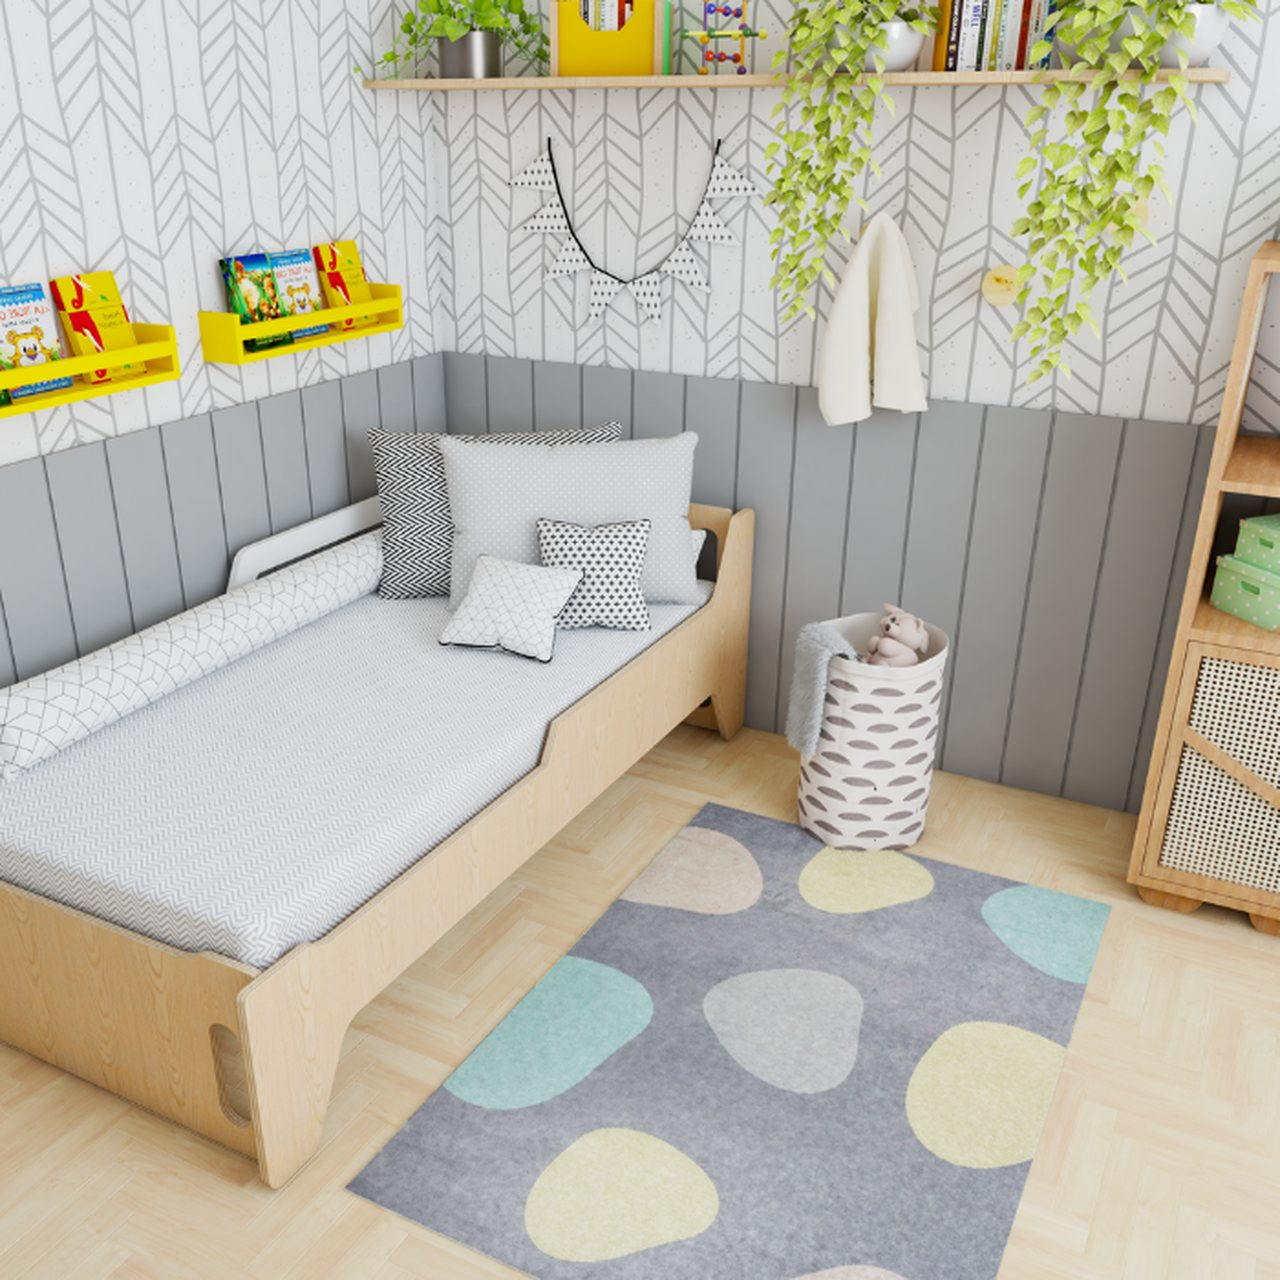 Tapete quarto infantil estampa Bolhas  - Pomelo Decor